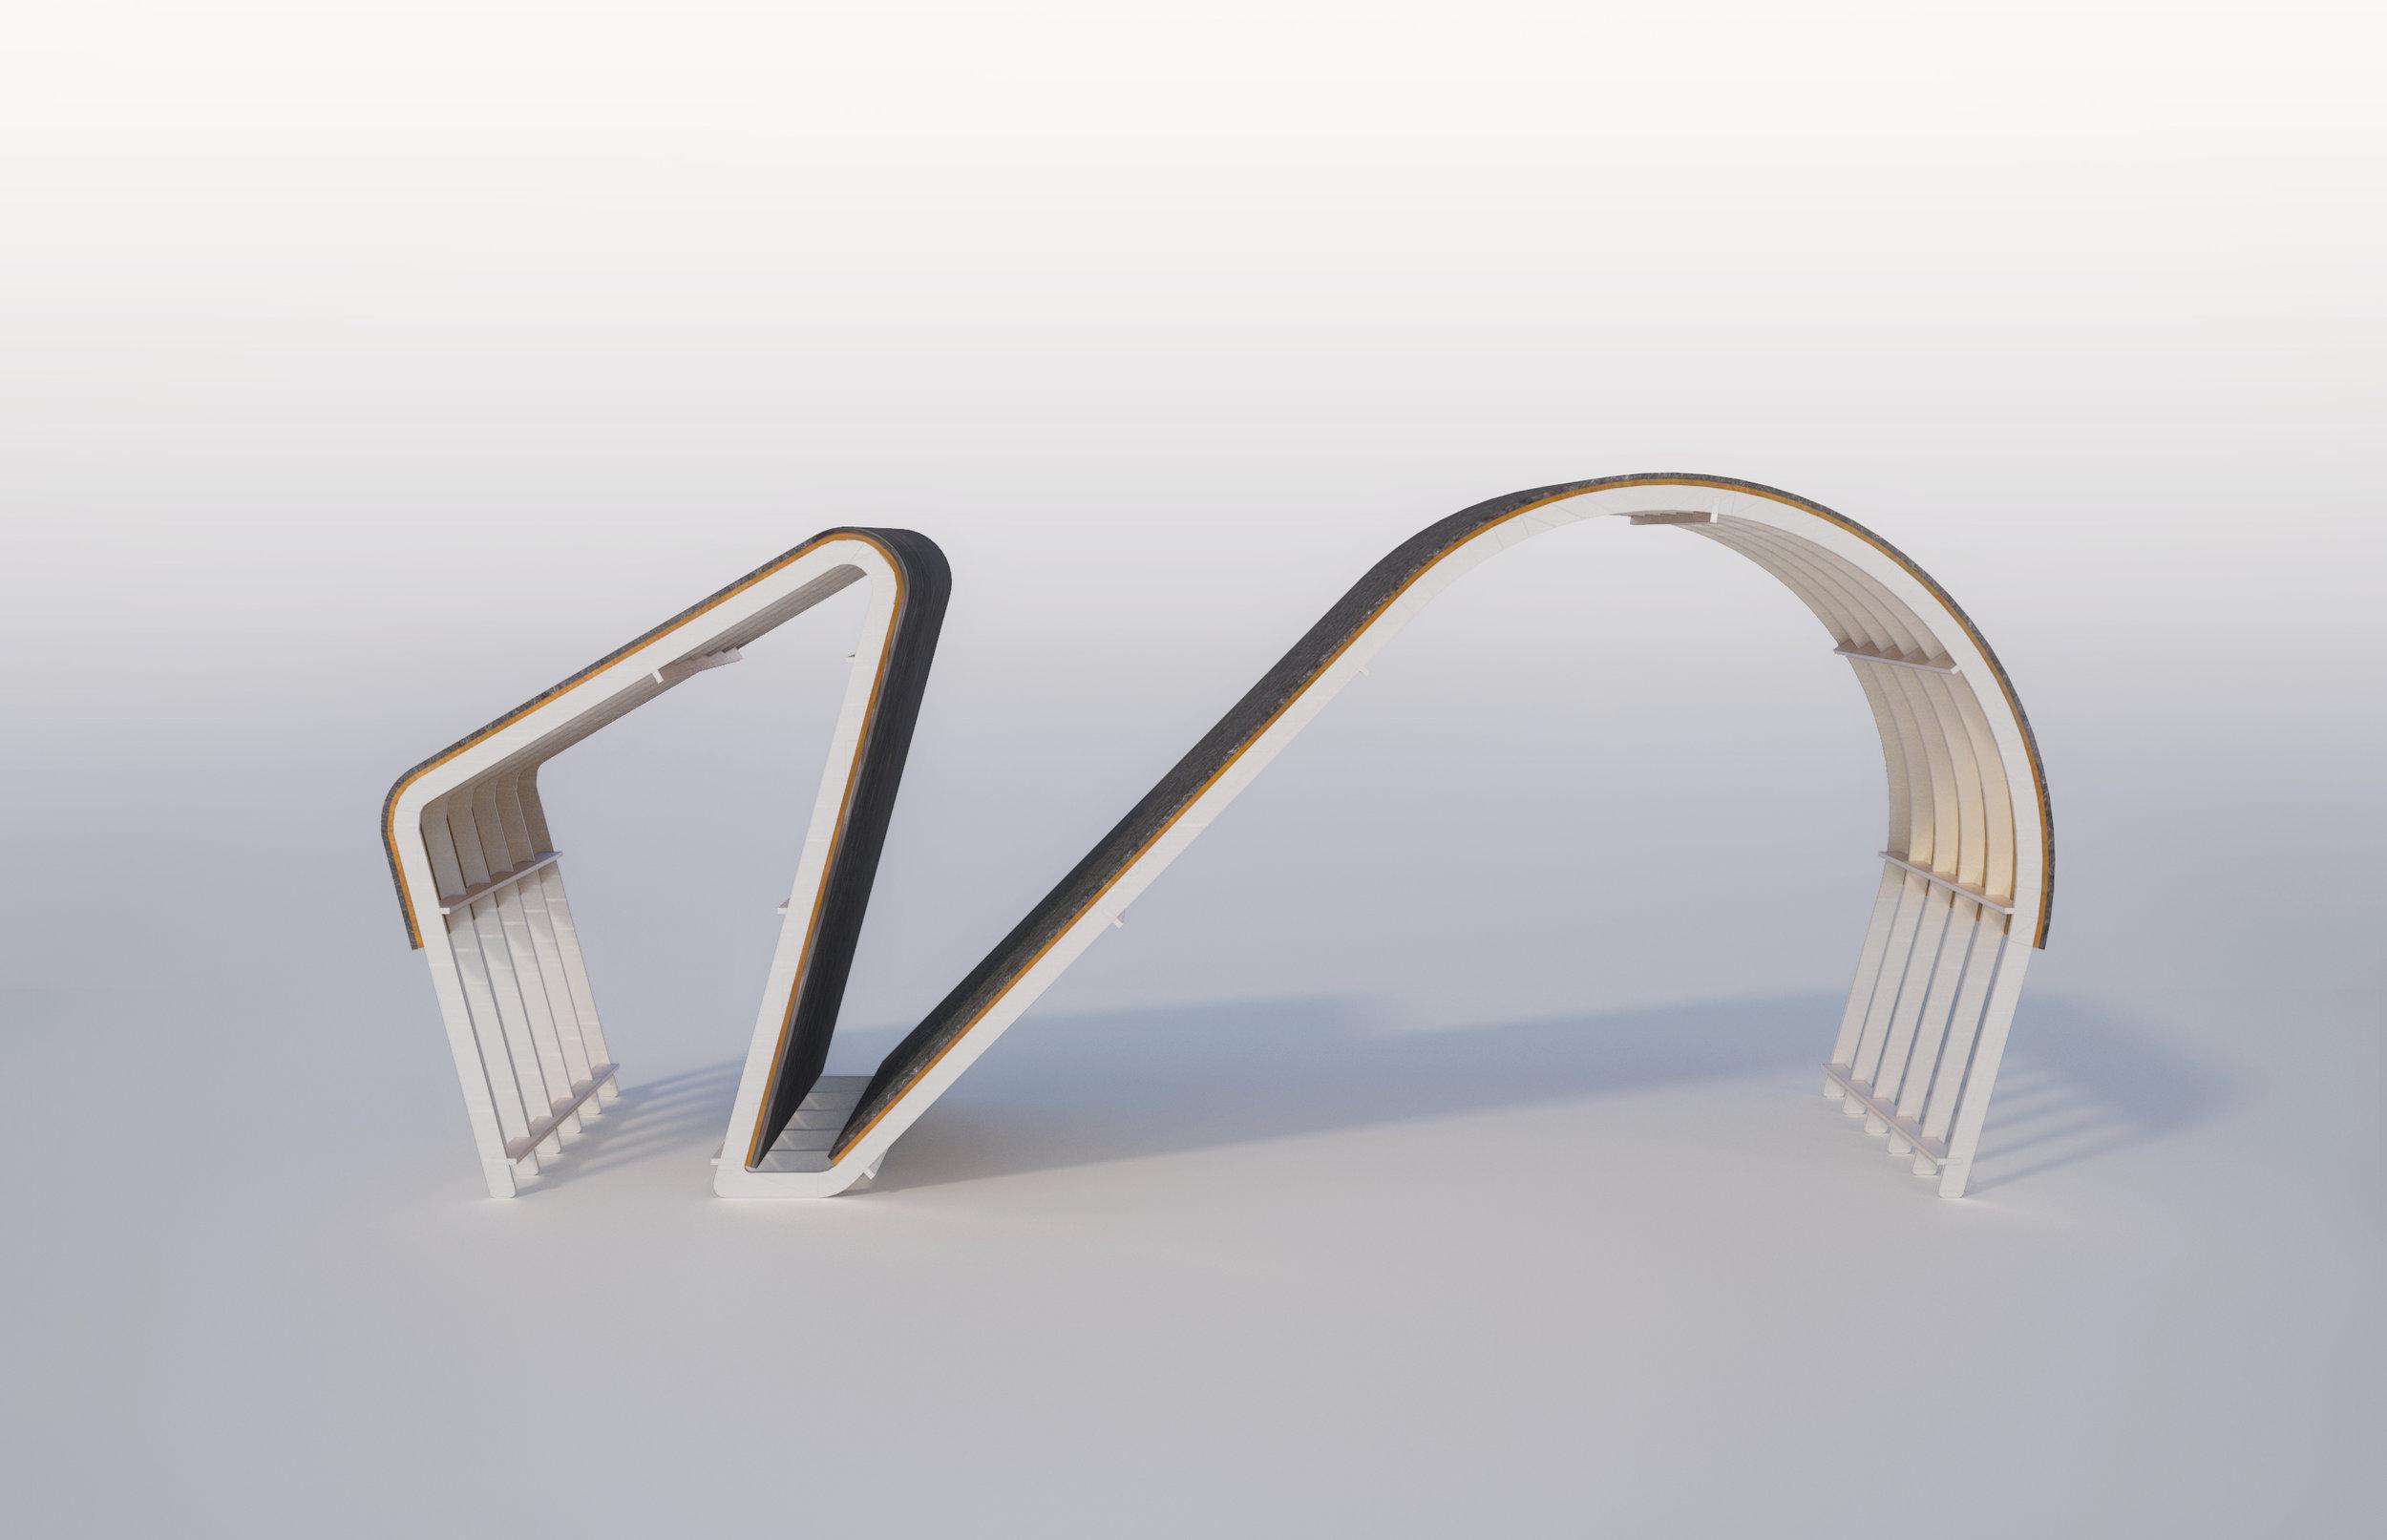 17703 Cor opus, Spine Chair - Elev 171221.jpg